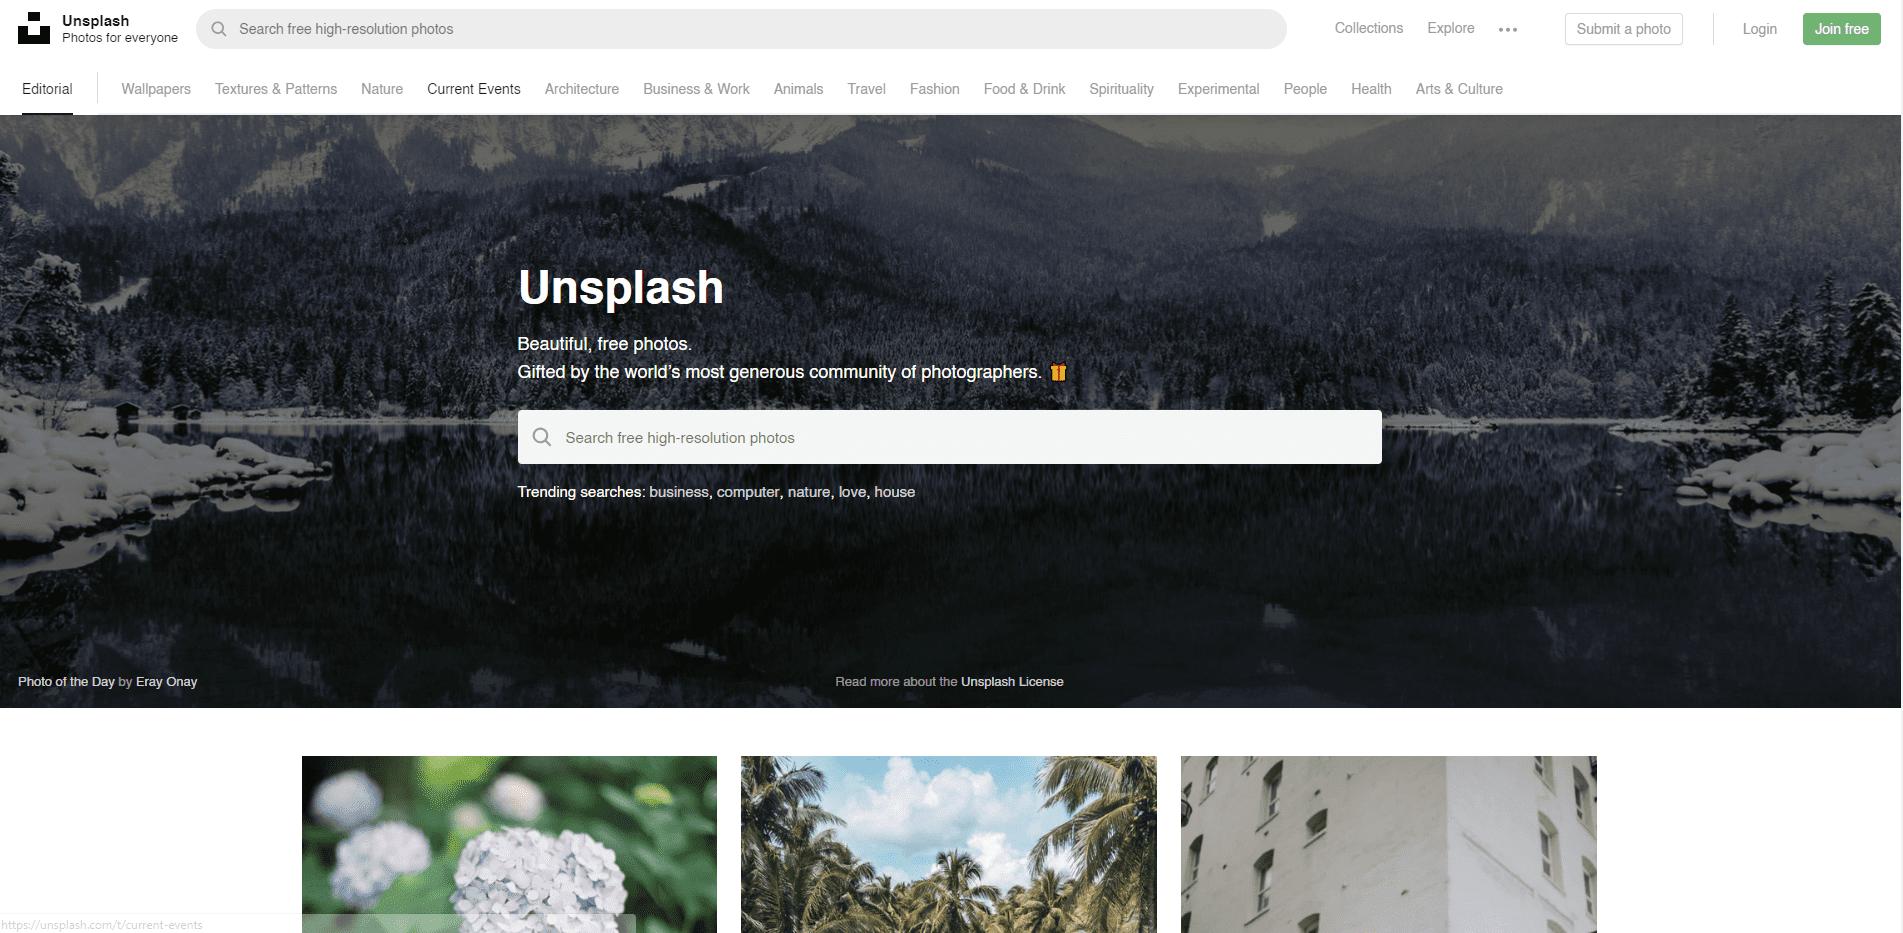 Free stock photo library - Unsplash